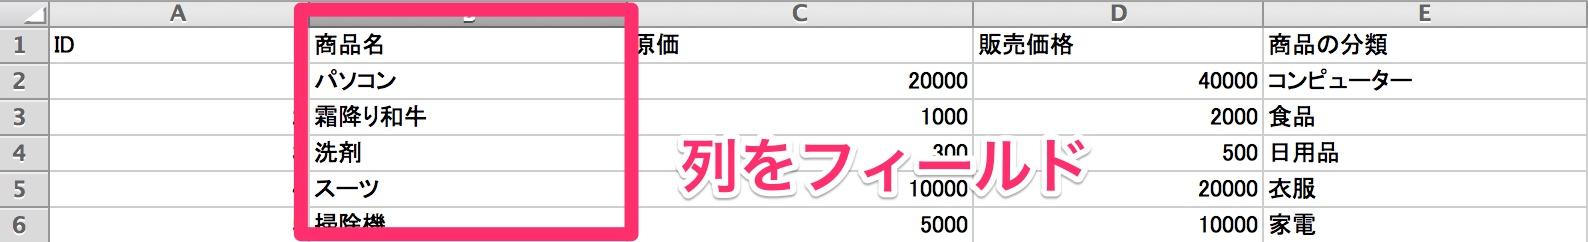 Screenshot_2016_07_26_9_51